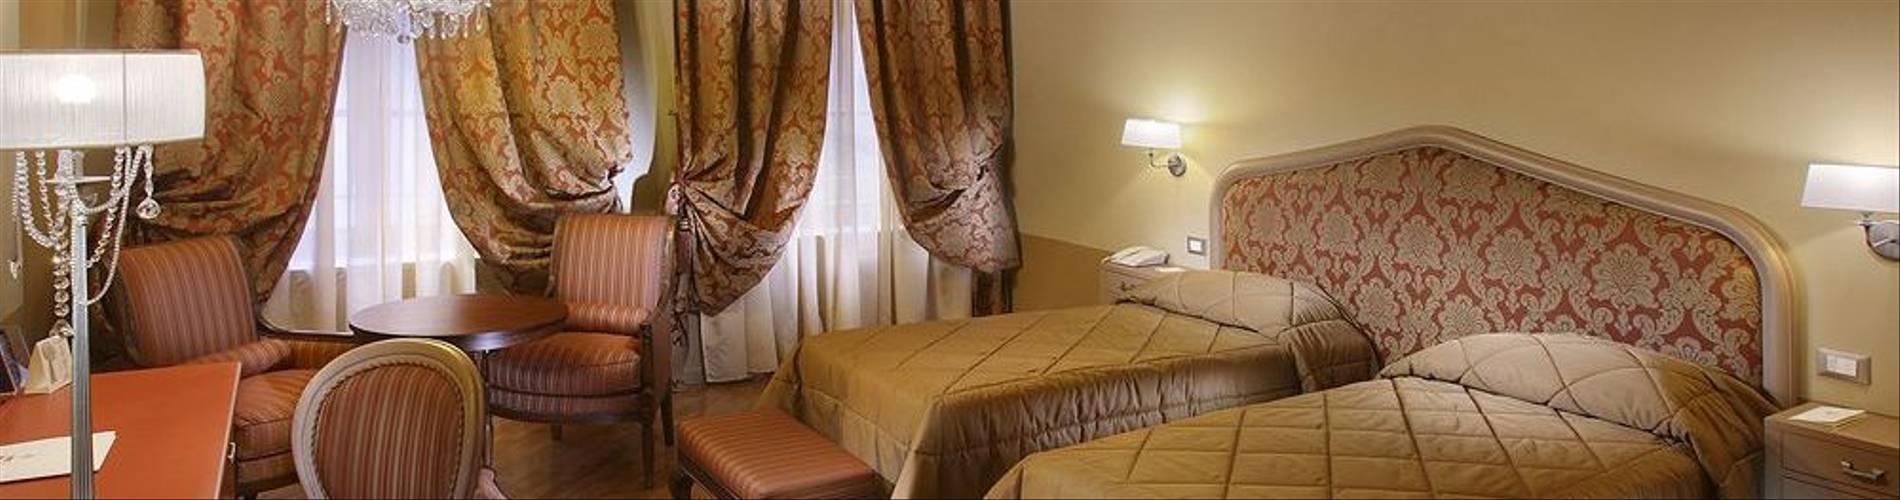 09-Hotel San Luca Palace.jpg